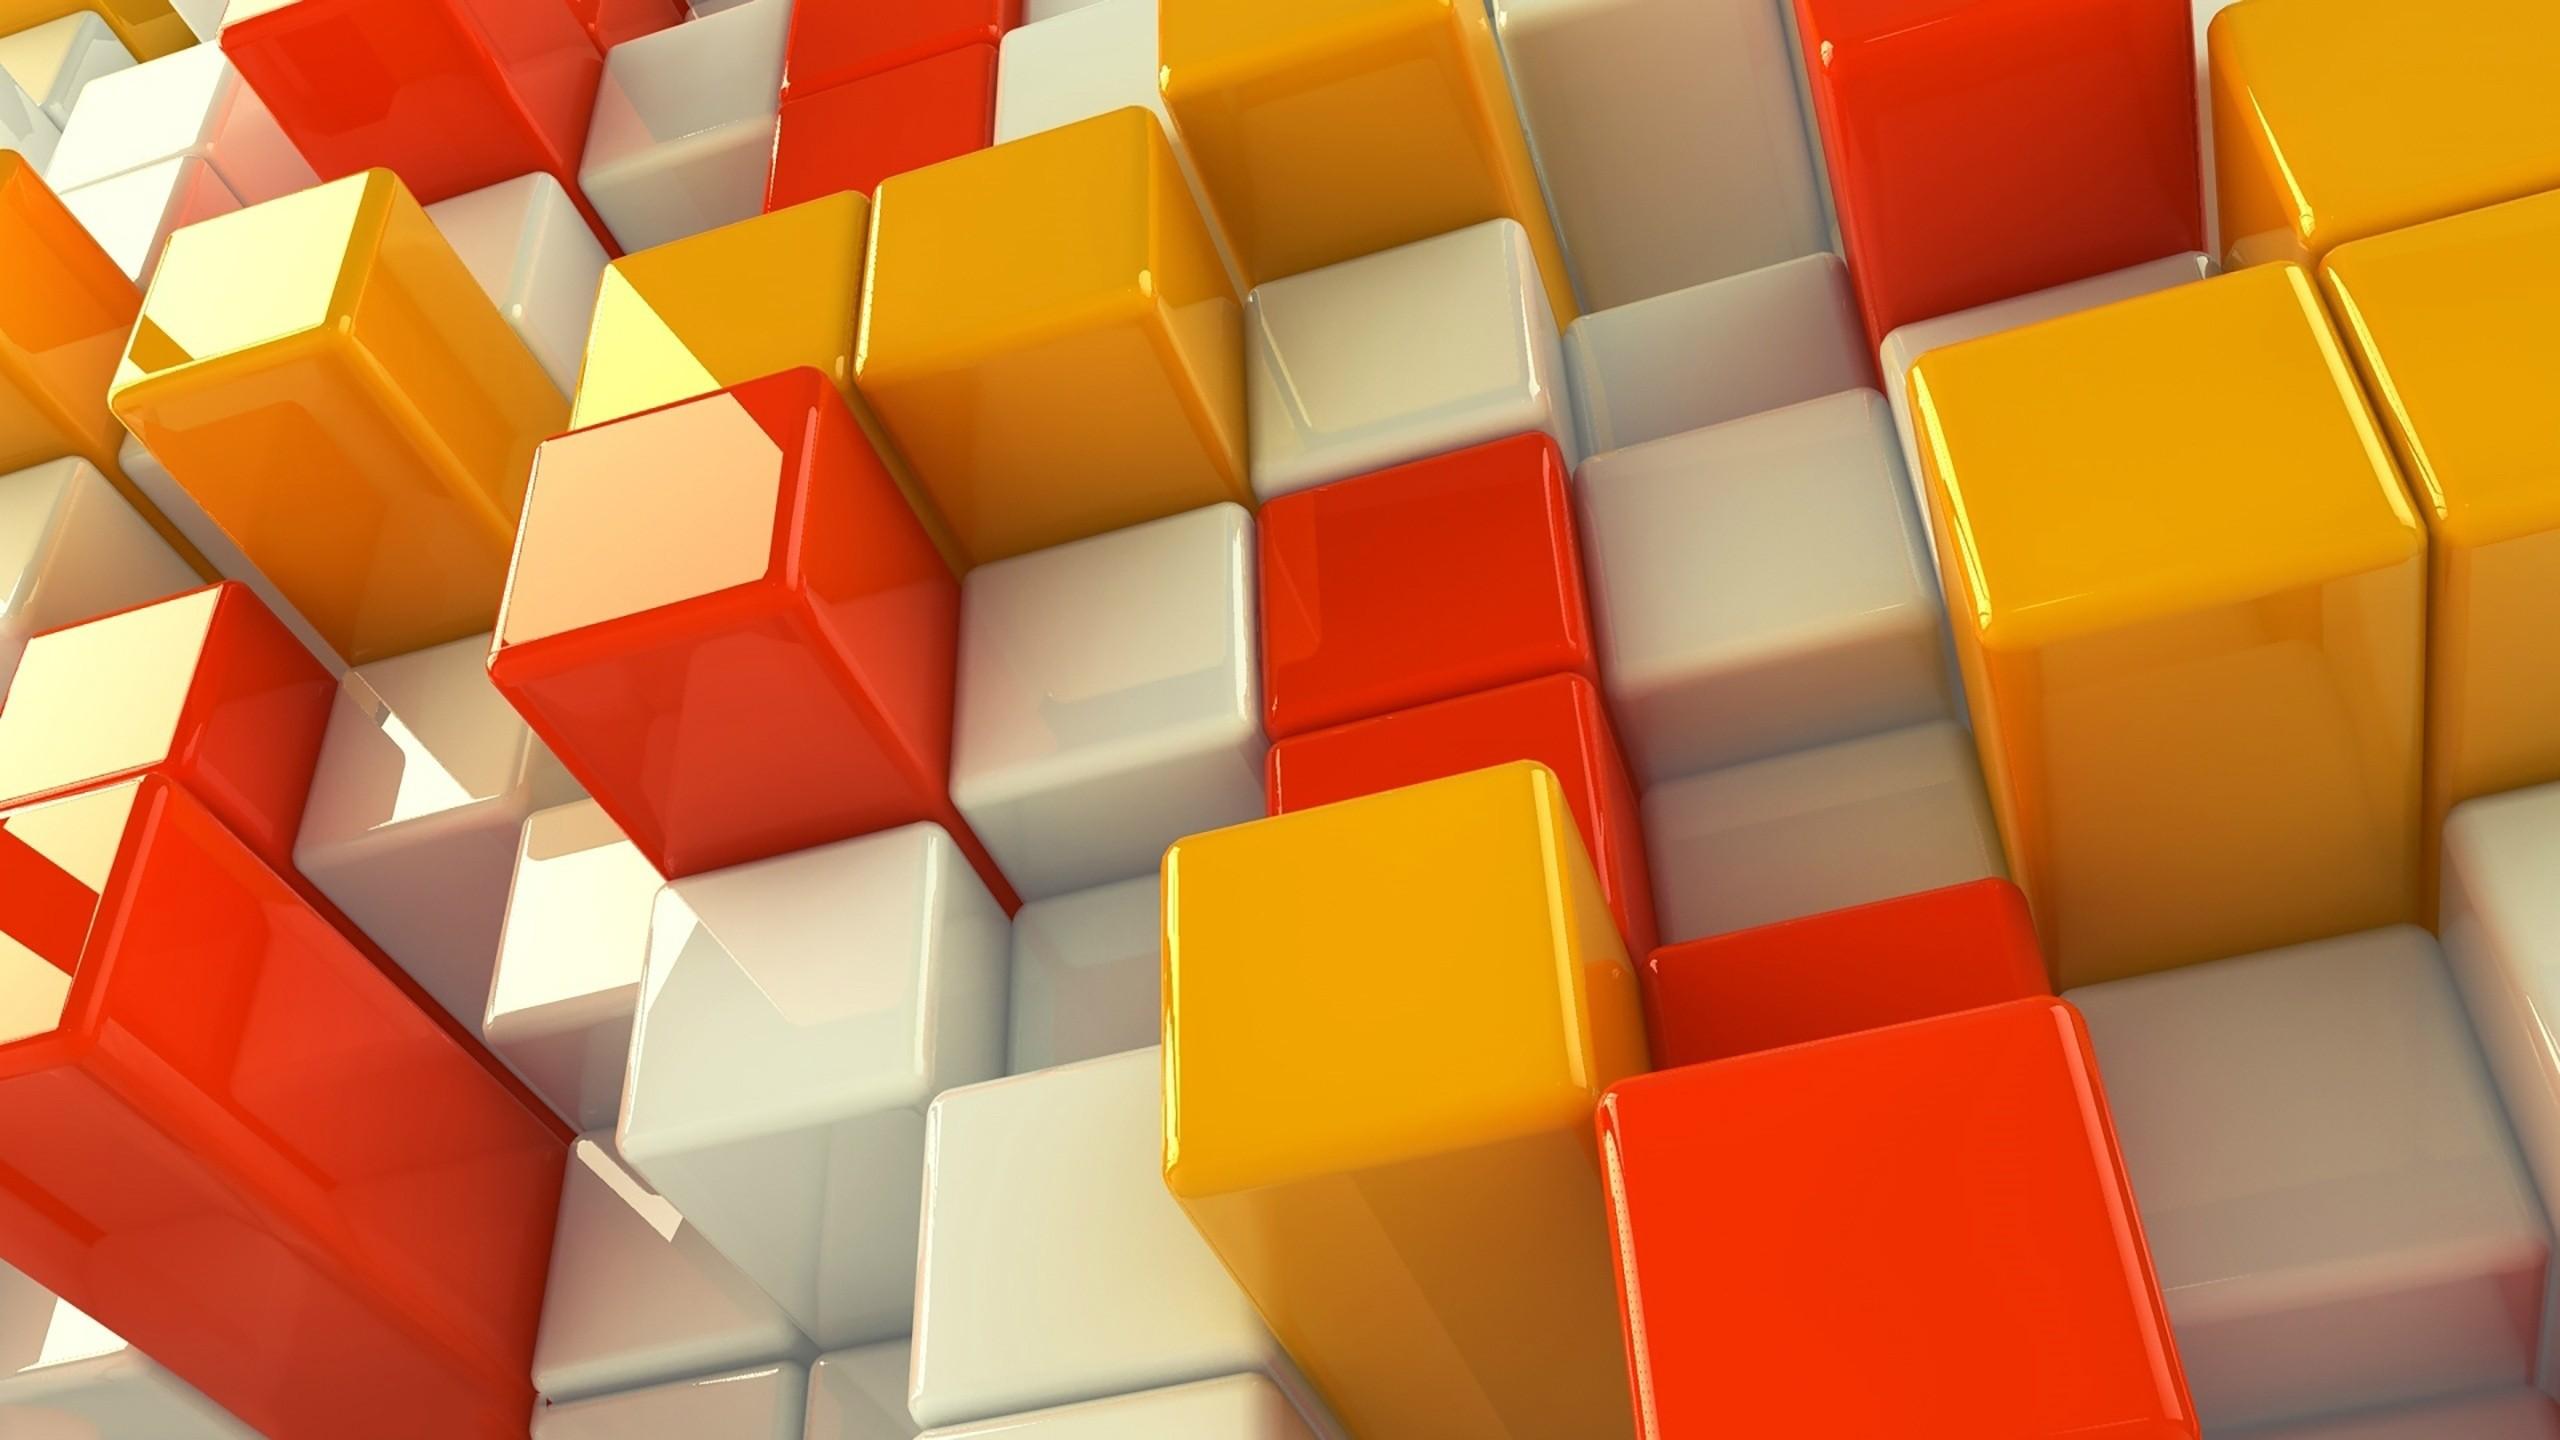 White Orange And Yellow Cubes